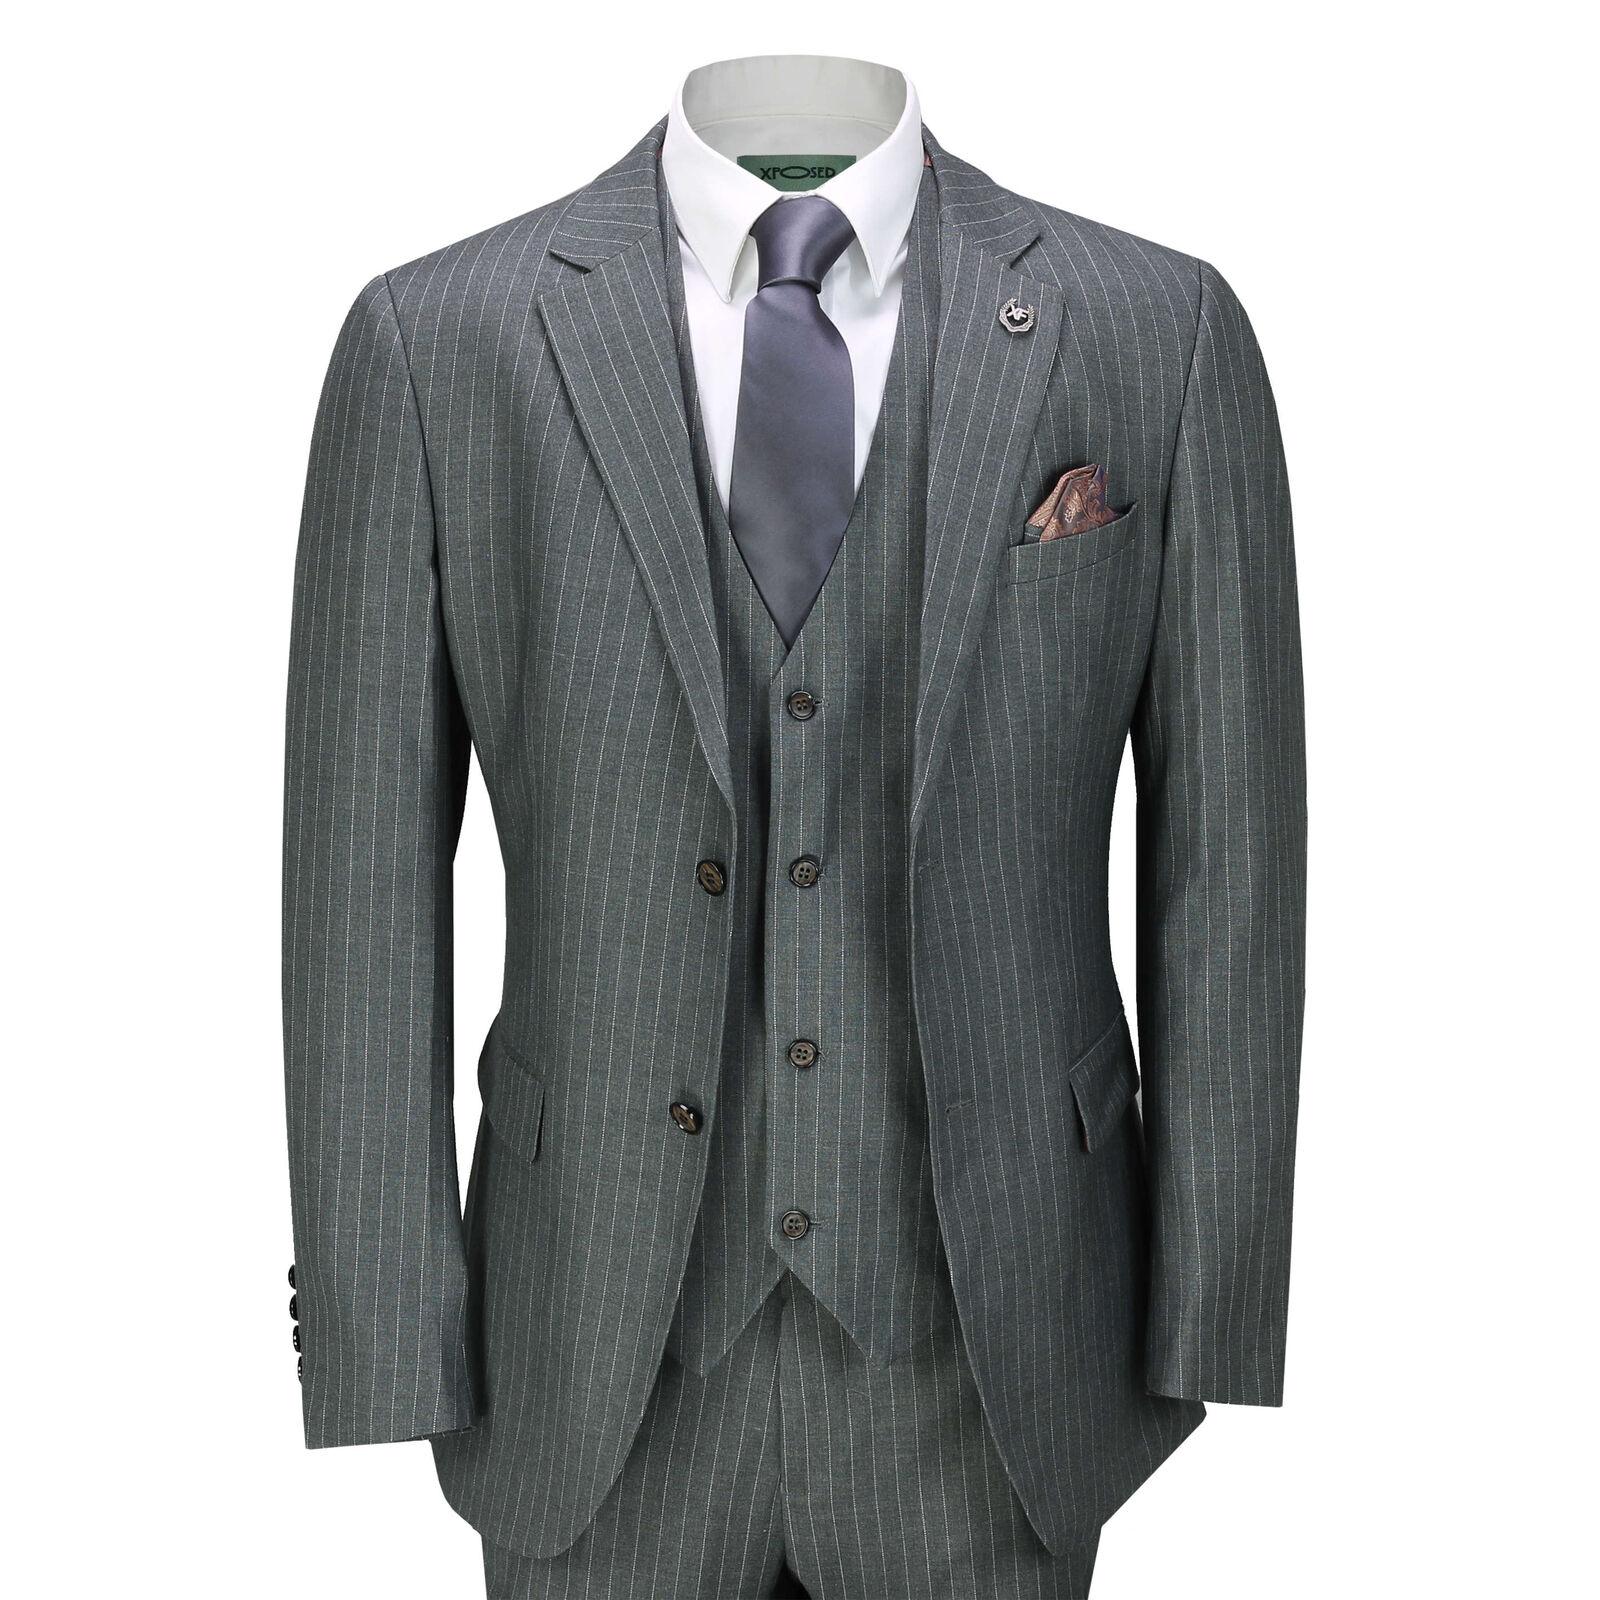 Mens Classic 3 Piece Pin Stripe Grey Suit Retro 1920s Smart Tailored Fit